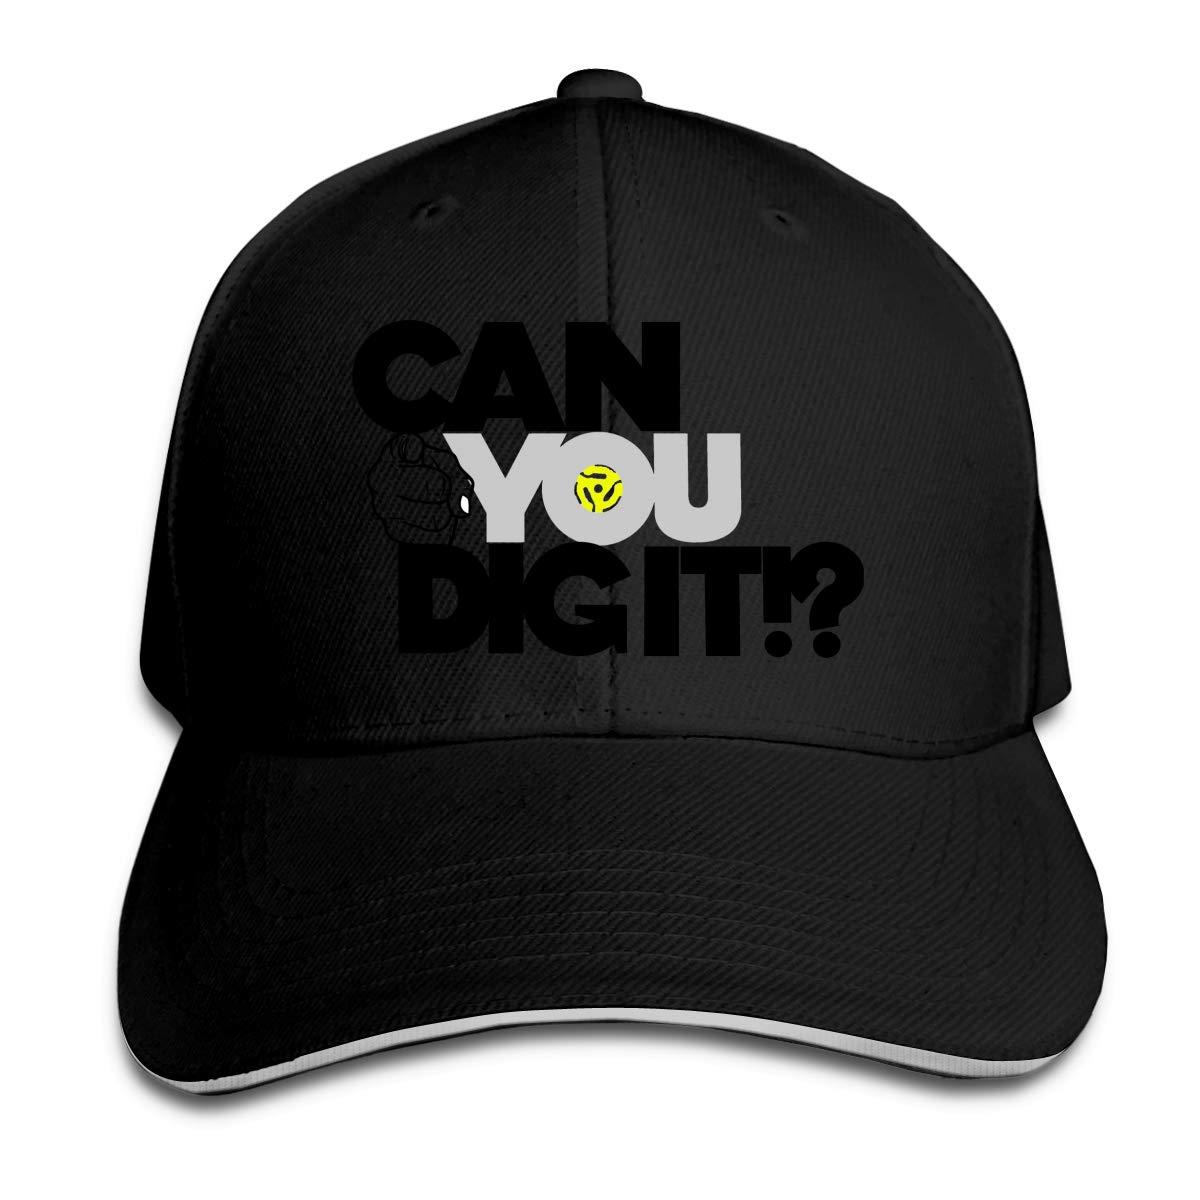 Can You Dig It Unisex Adult Baseball Caps Adjustable Sandwich Caps Jeans Caps Adjustable Denim Trucker Cap